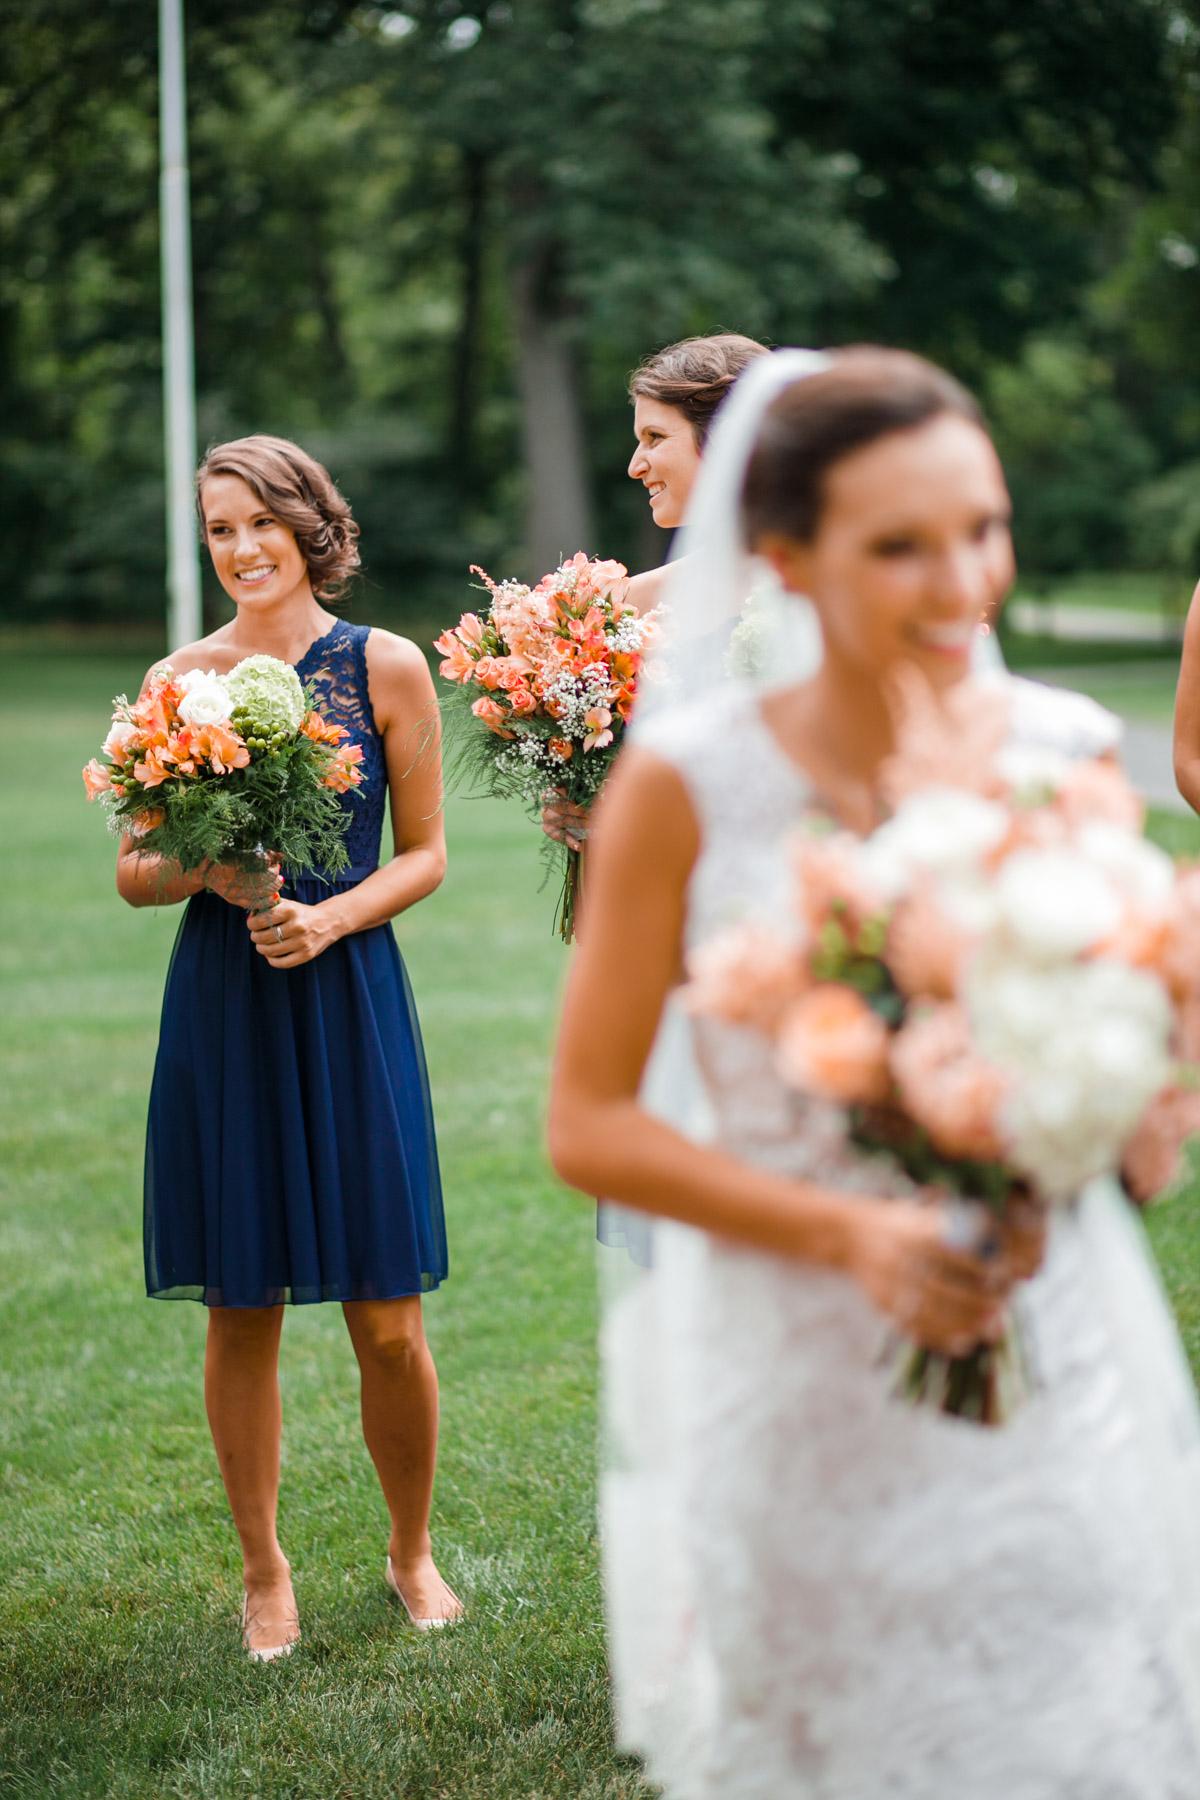 wildwood-park-wedding-photos-49.jpg